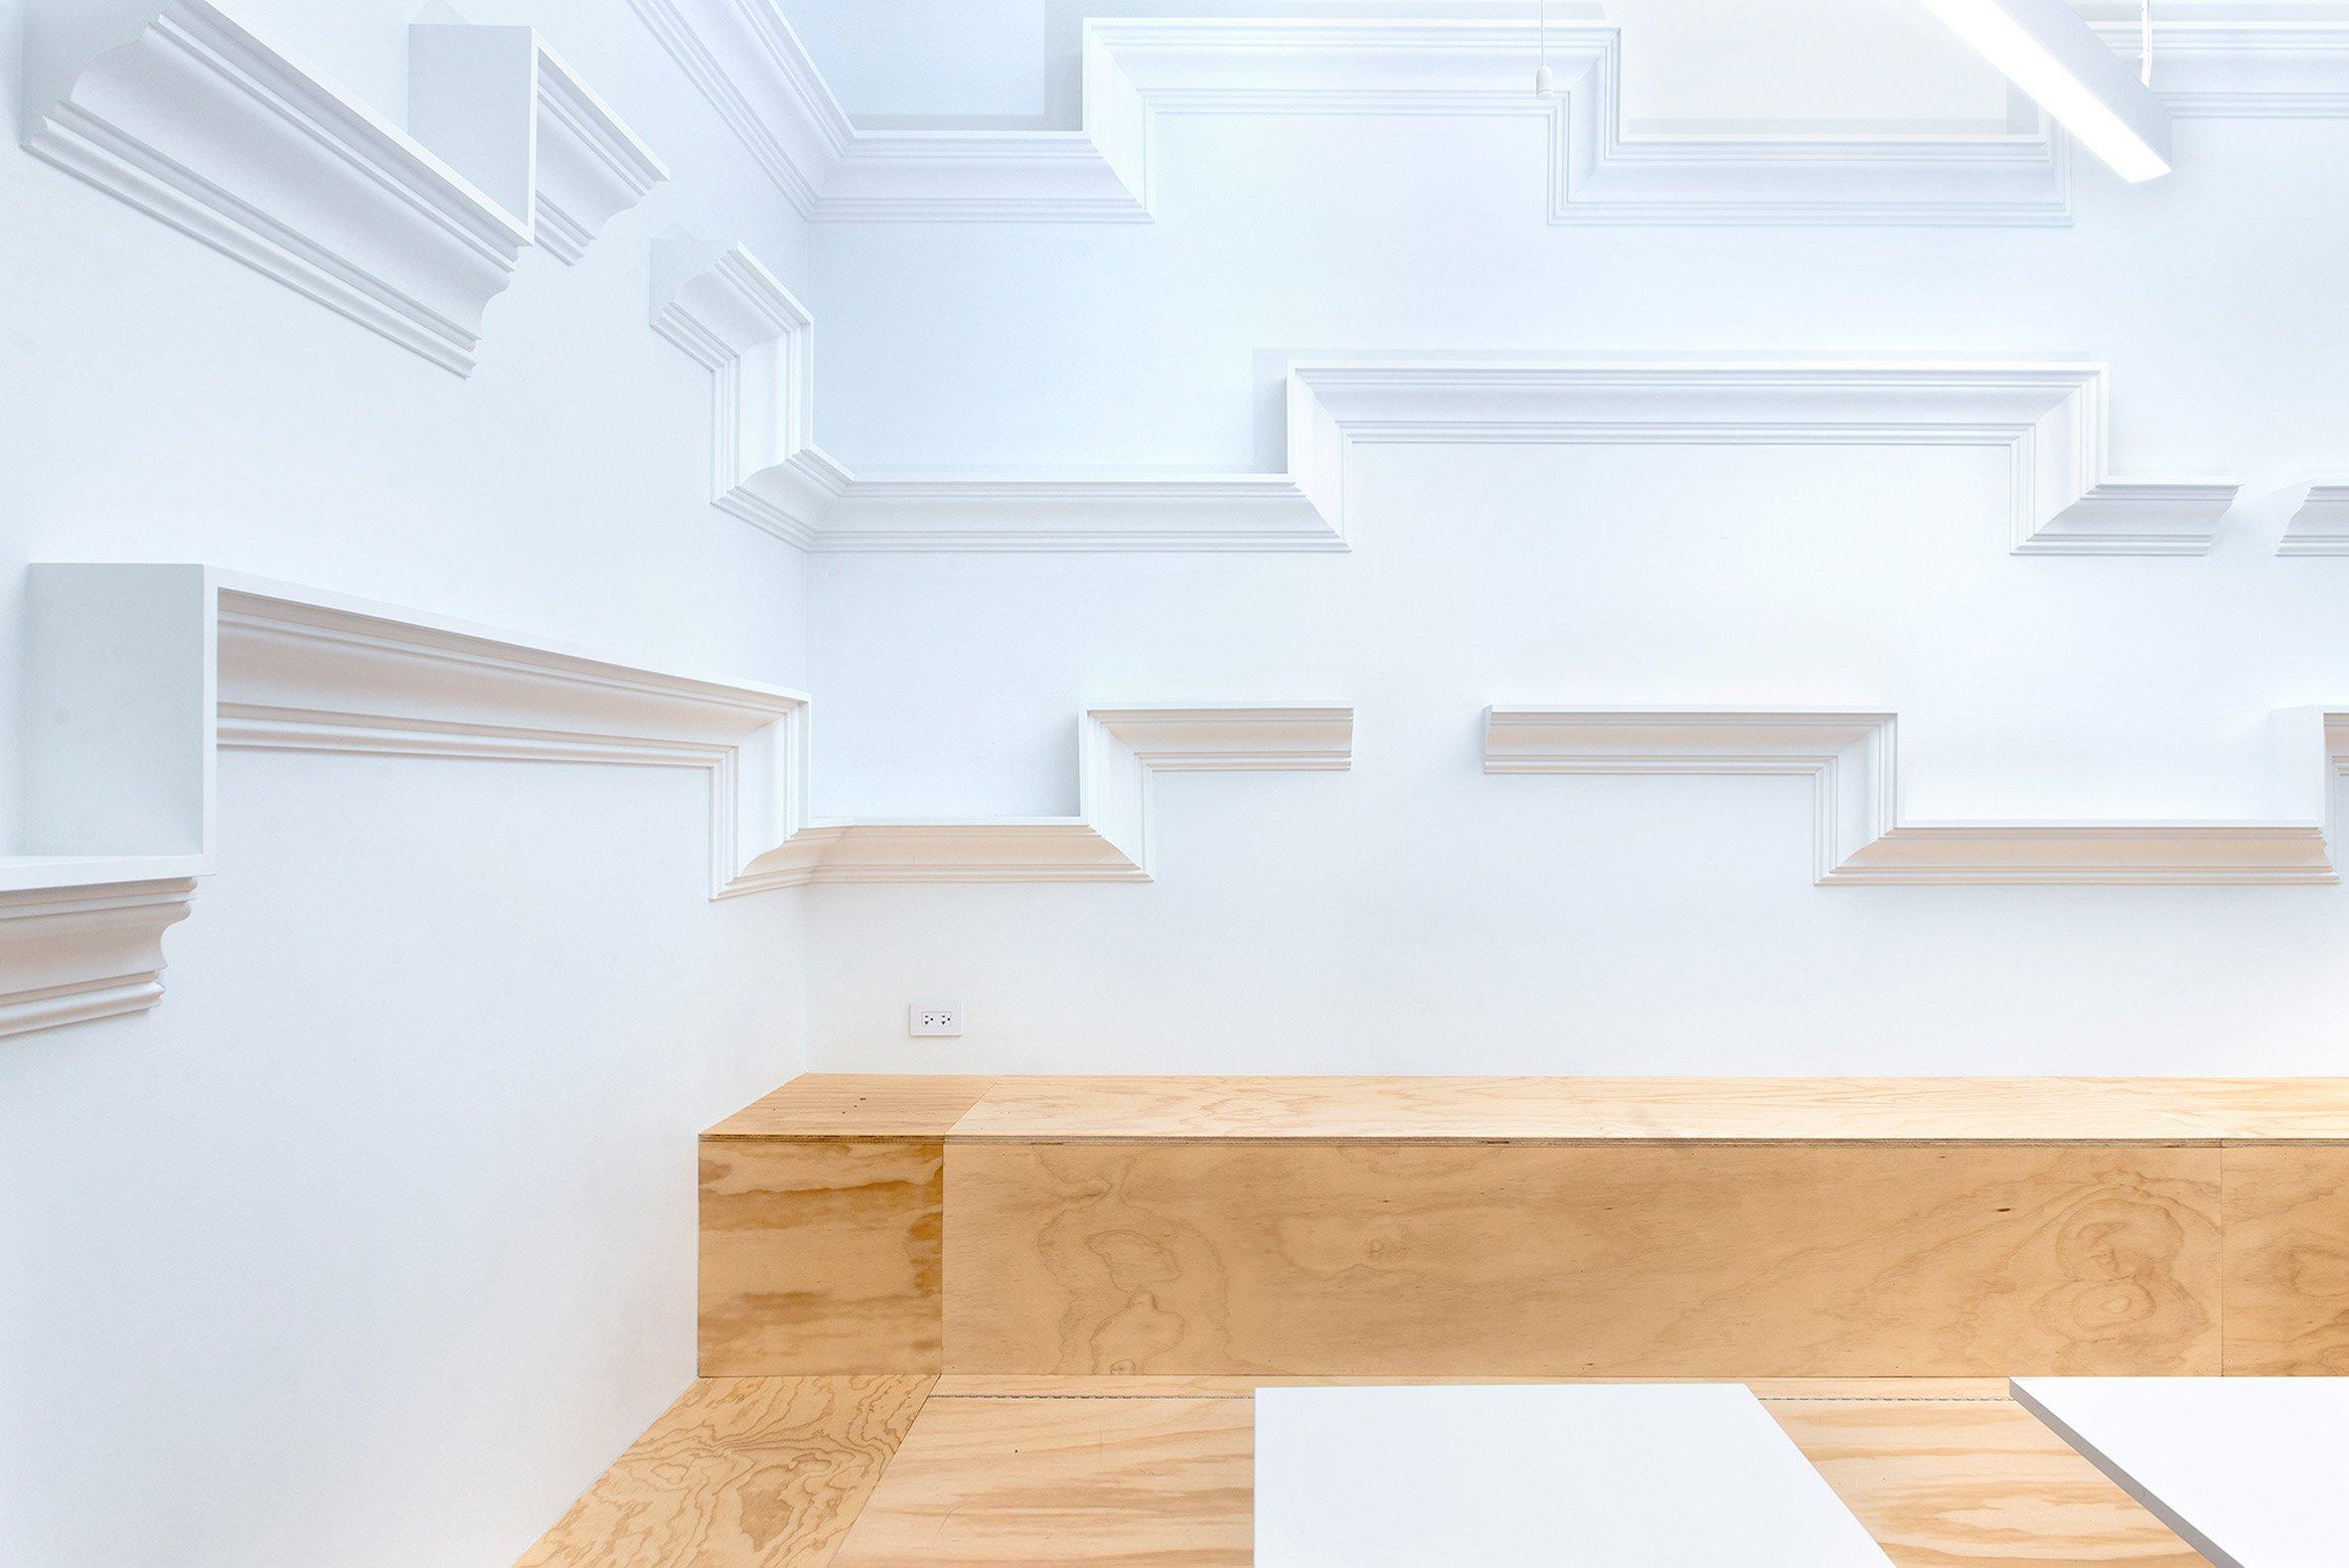 architecture-interiors-offices- manhatten-new-york-design-studia-osnovadesign-osnova-poltava_22